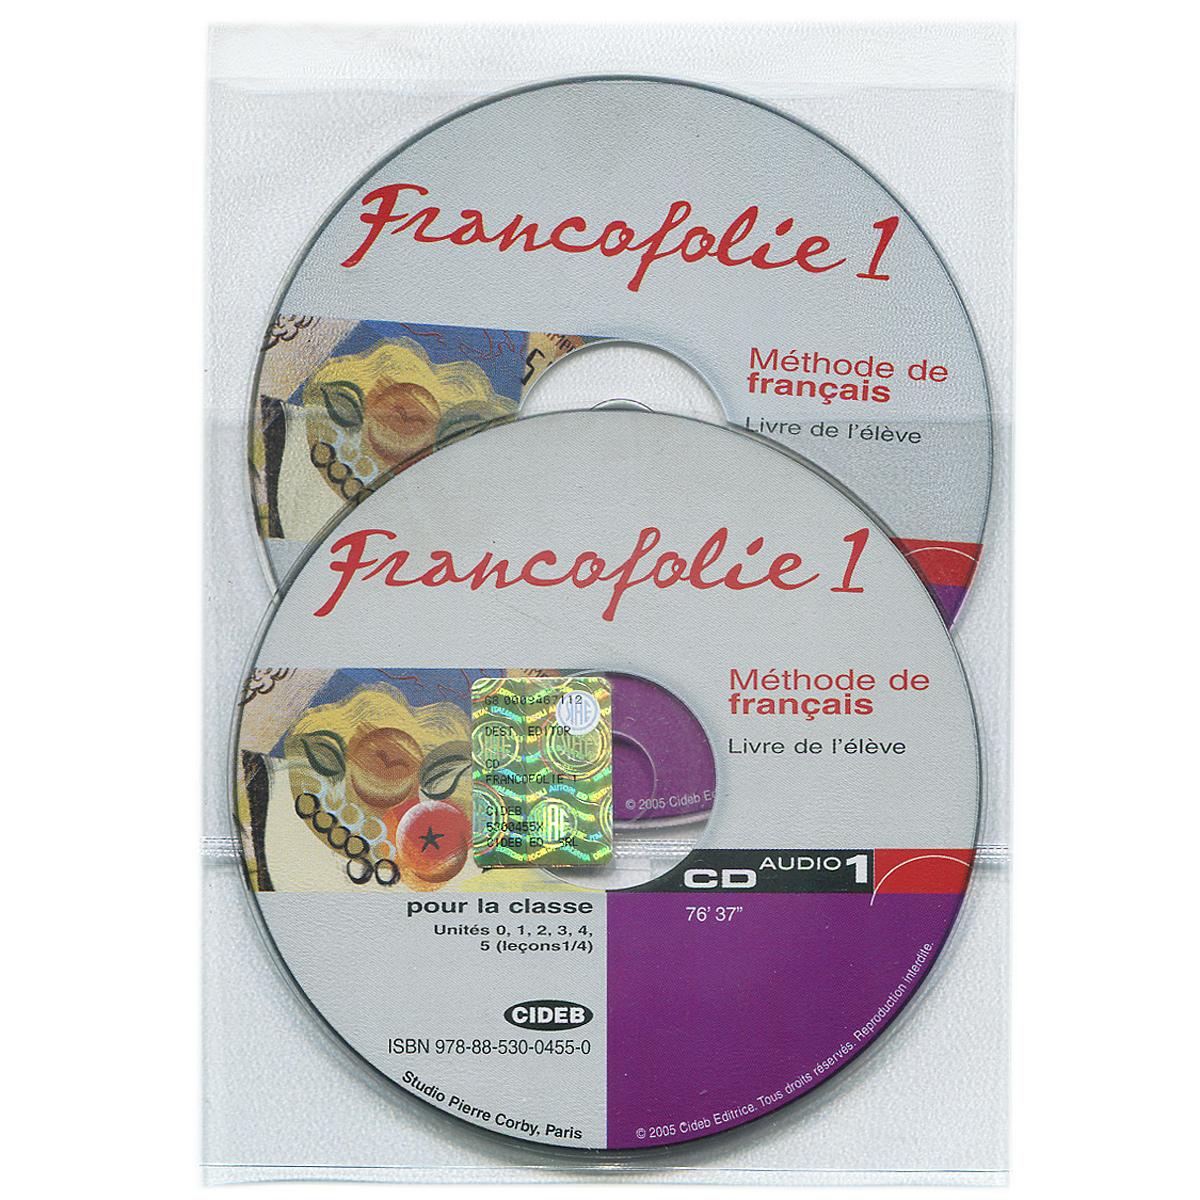 Francofolie 1: Methode de Francais (аудиокурс на 2 CD) ( 978-88-530-0455-0 )